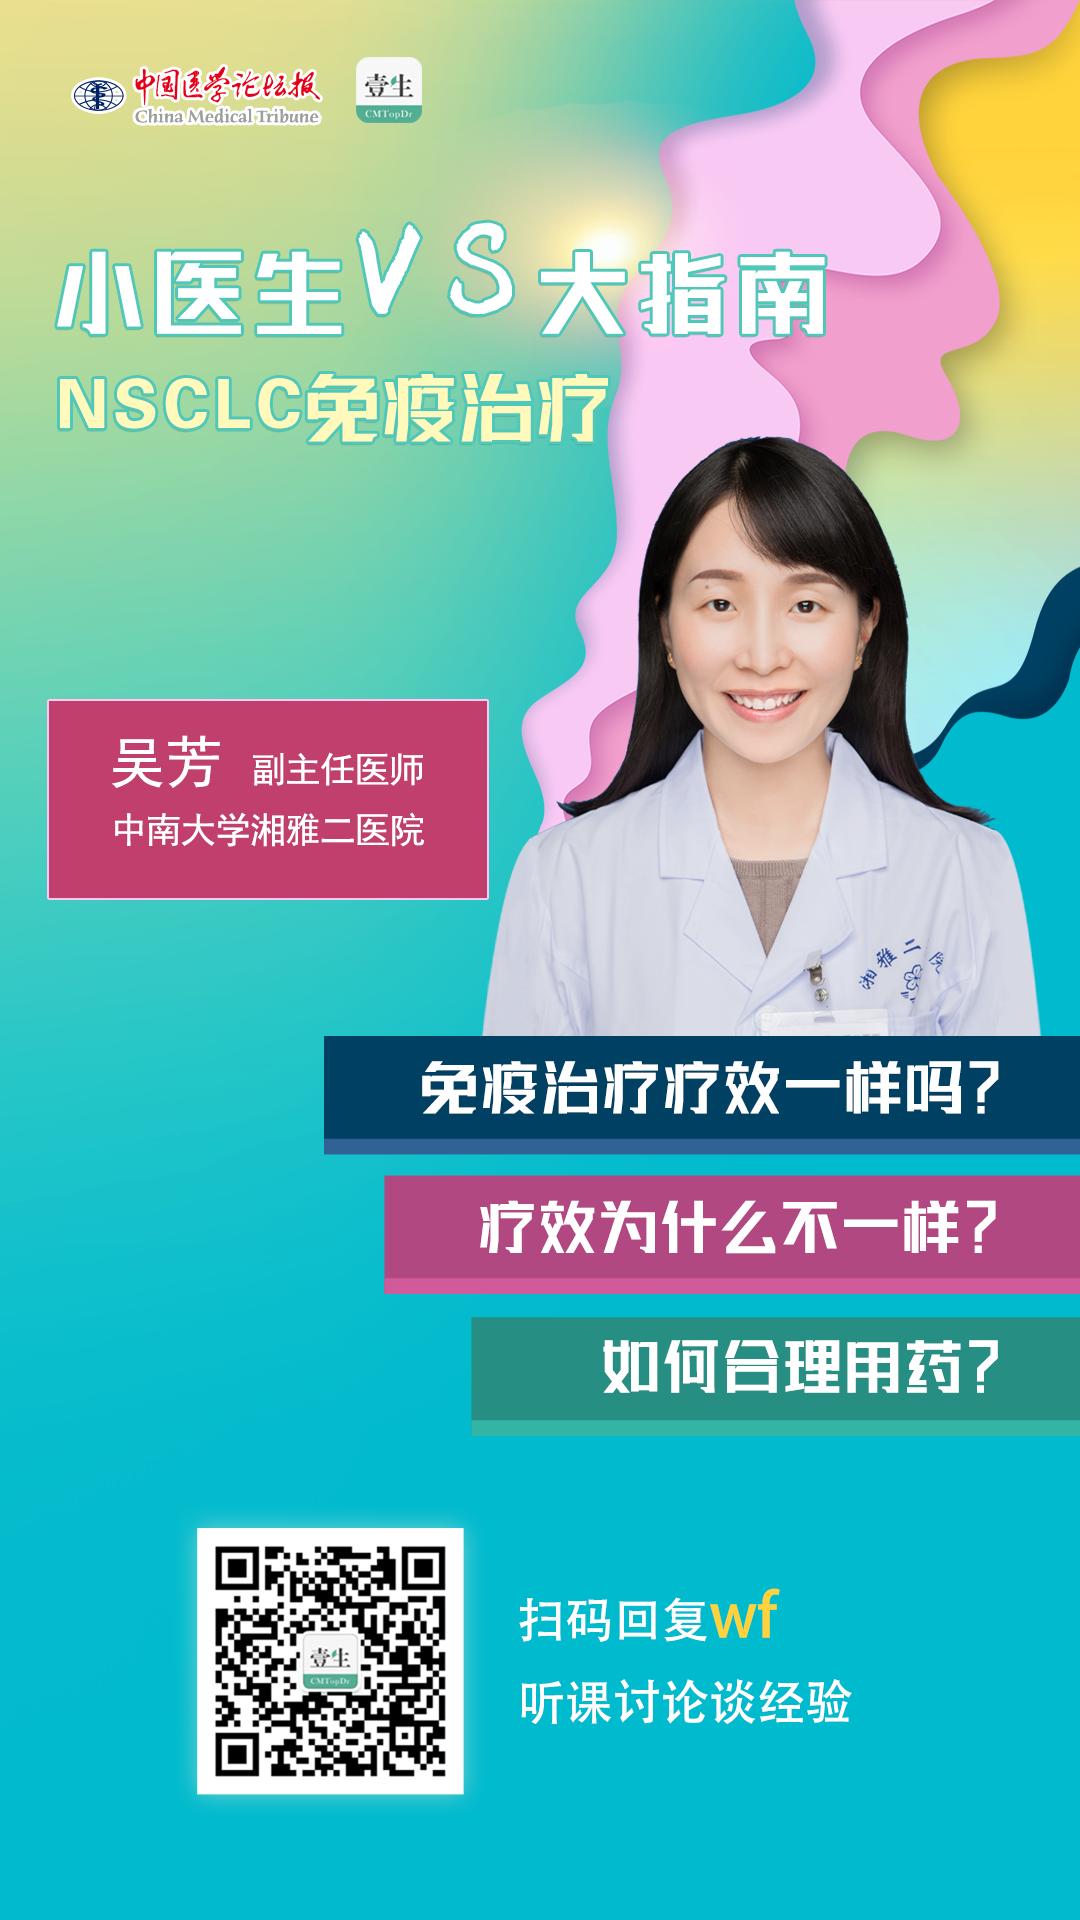 吴芳海报.png